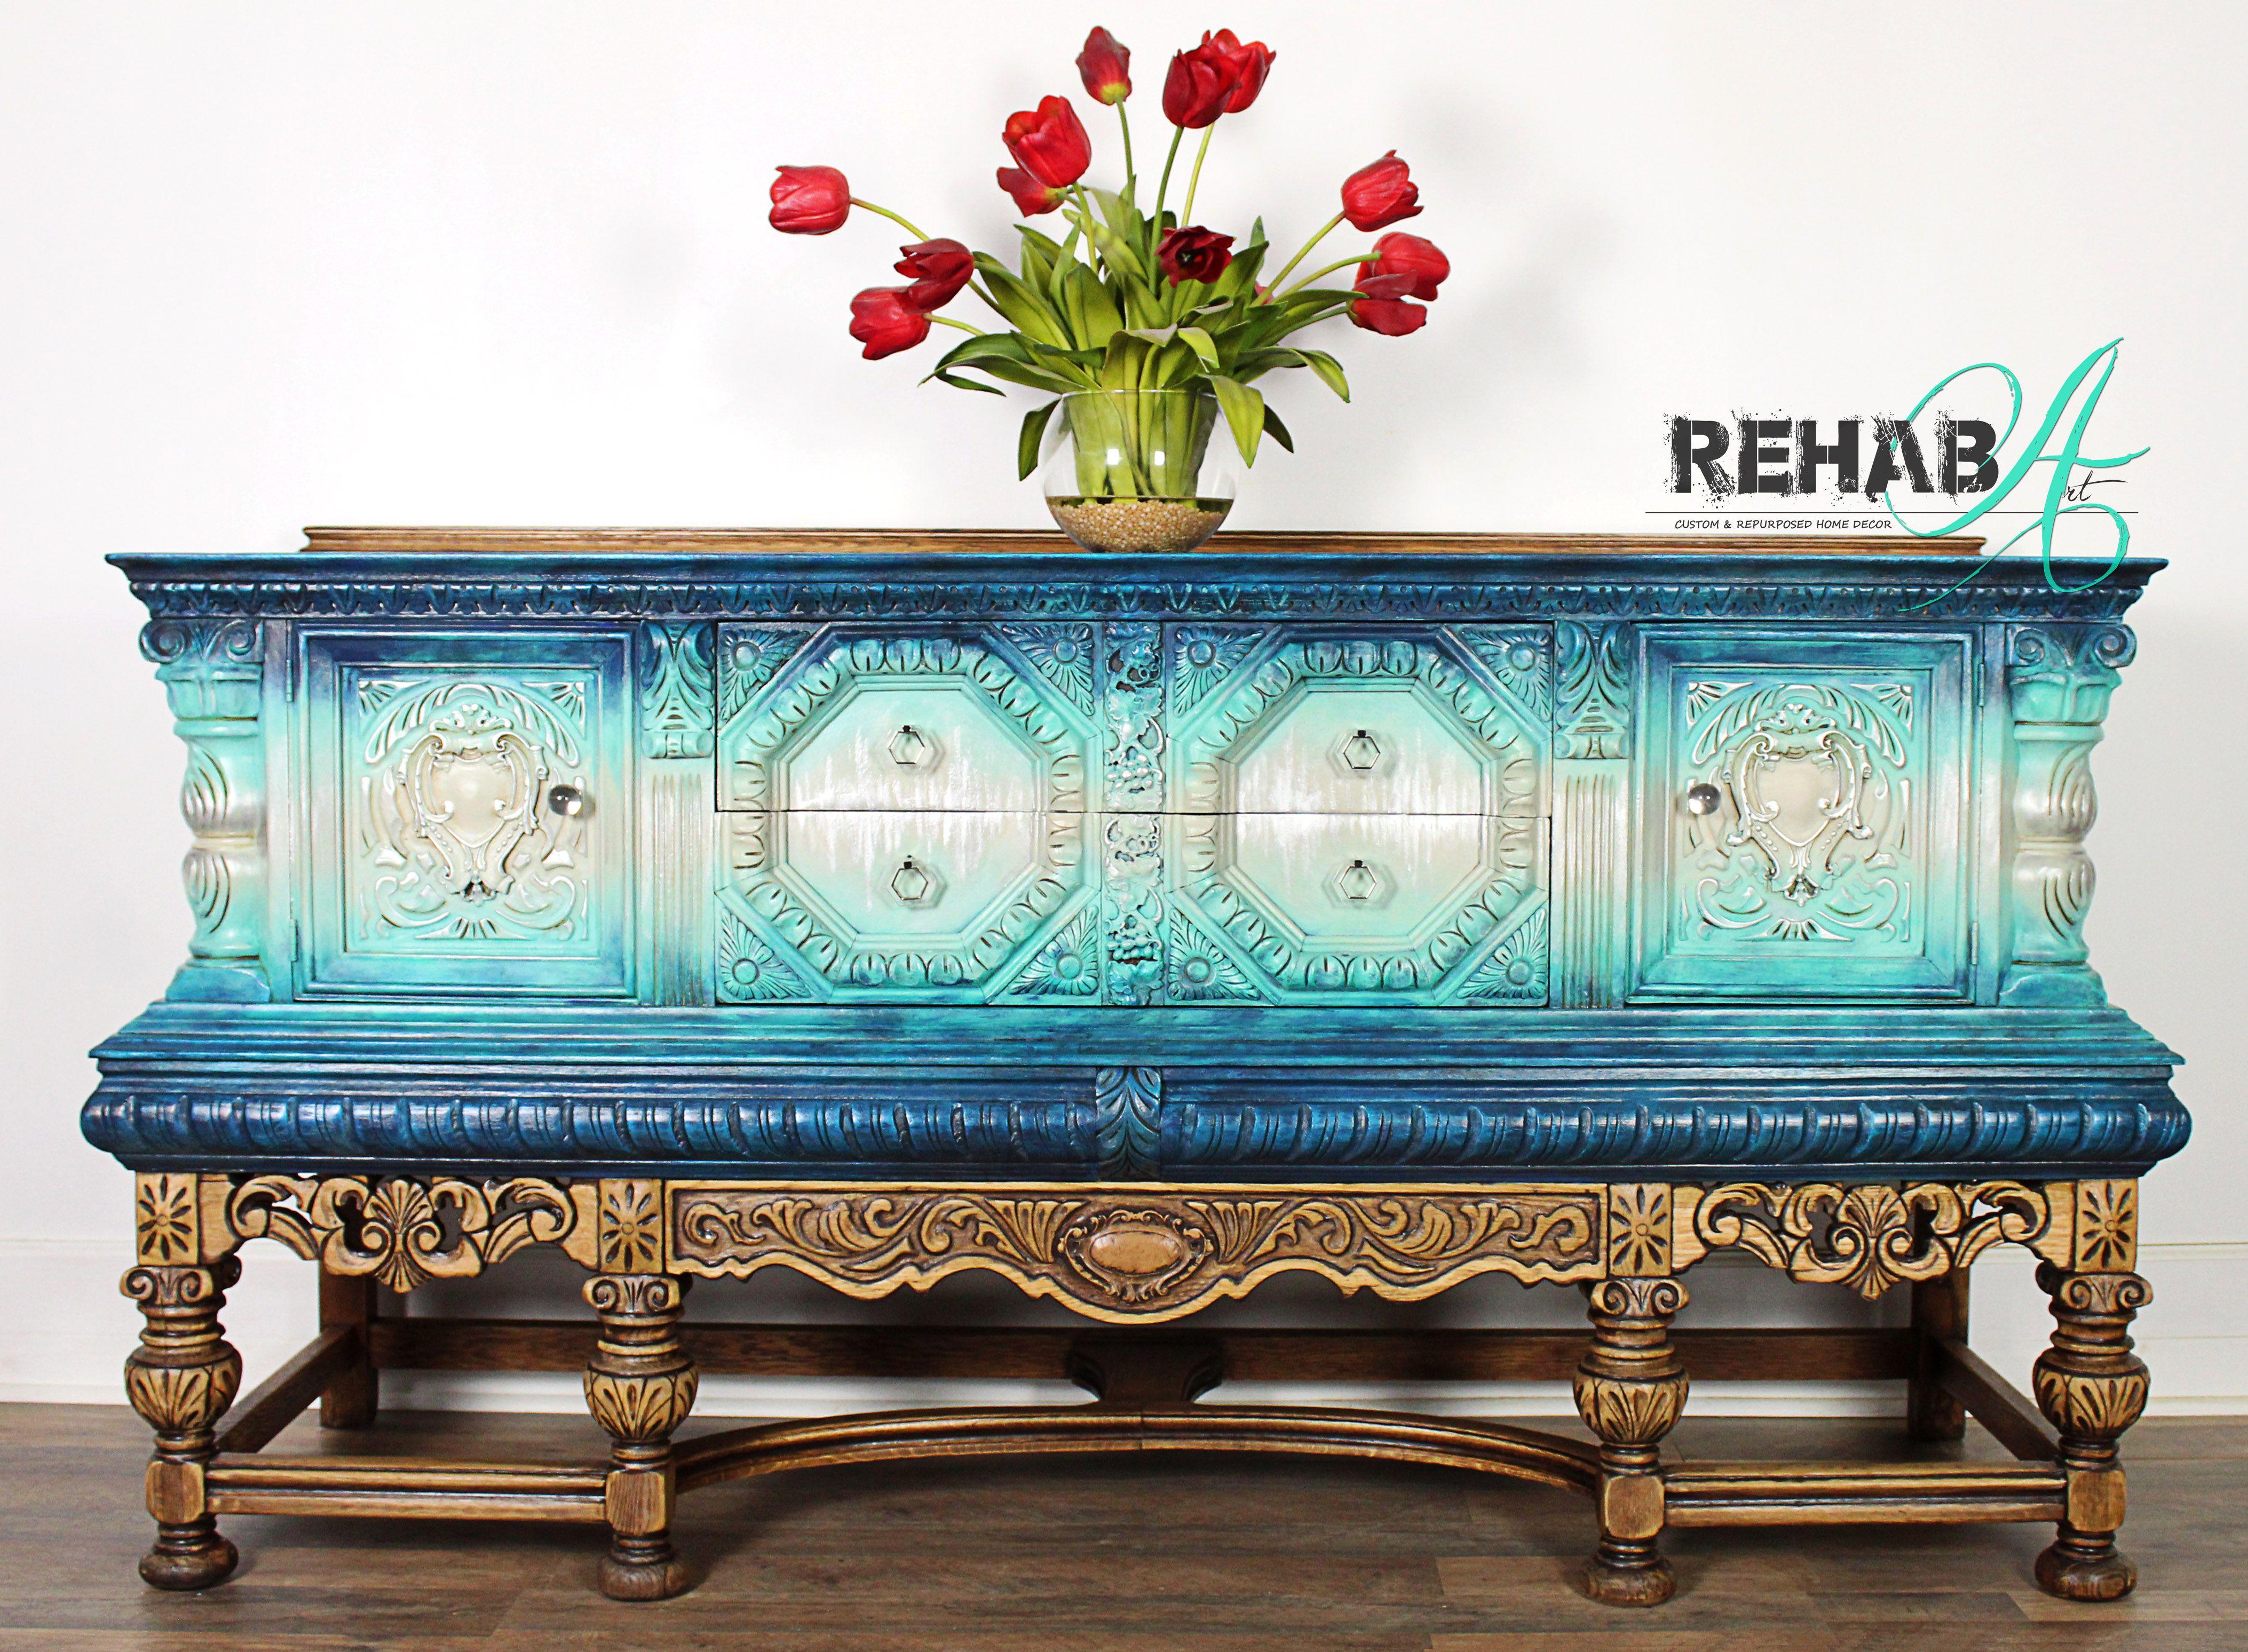 Available Now!!! #jacobeansideboard #credenza #aquadresser #paintedfurniture #furnitureartist #artonfurniture #oneofakindfurniture #bluepaintedfurniture #jacobeanfurniture #jacobeanbuffet